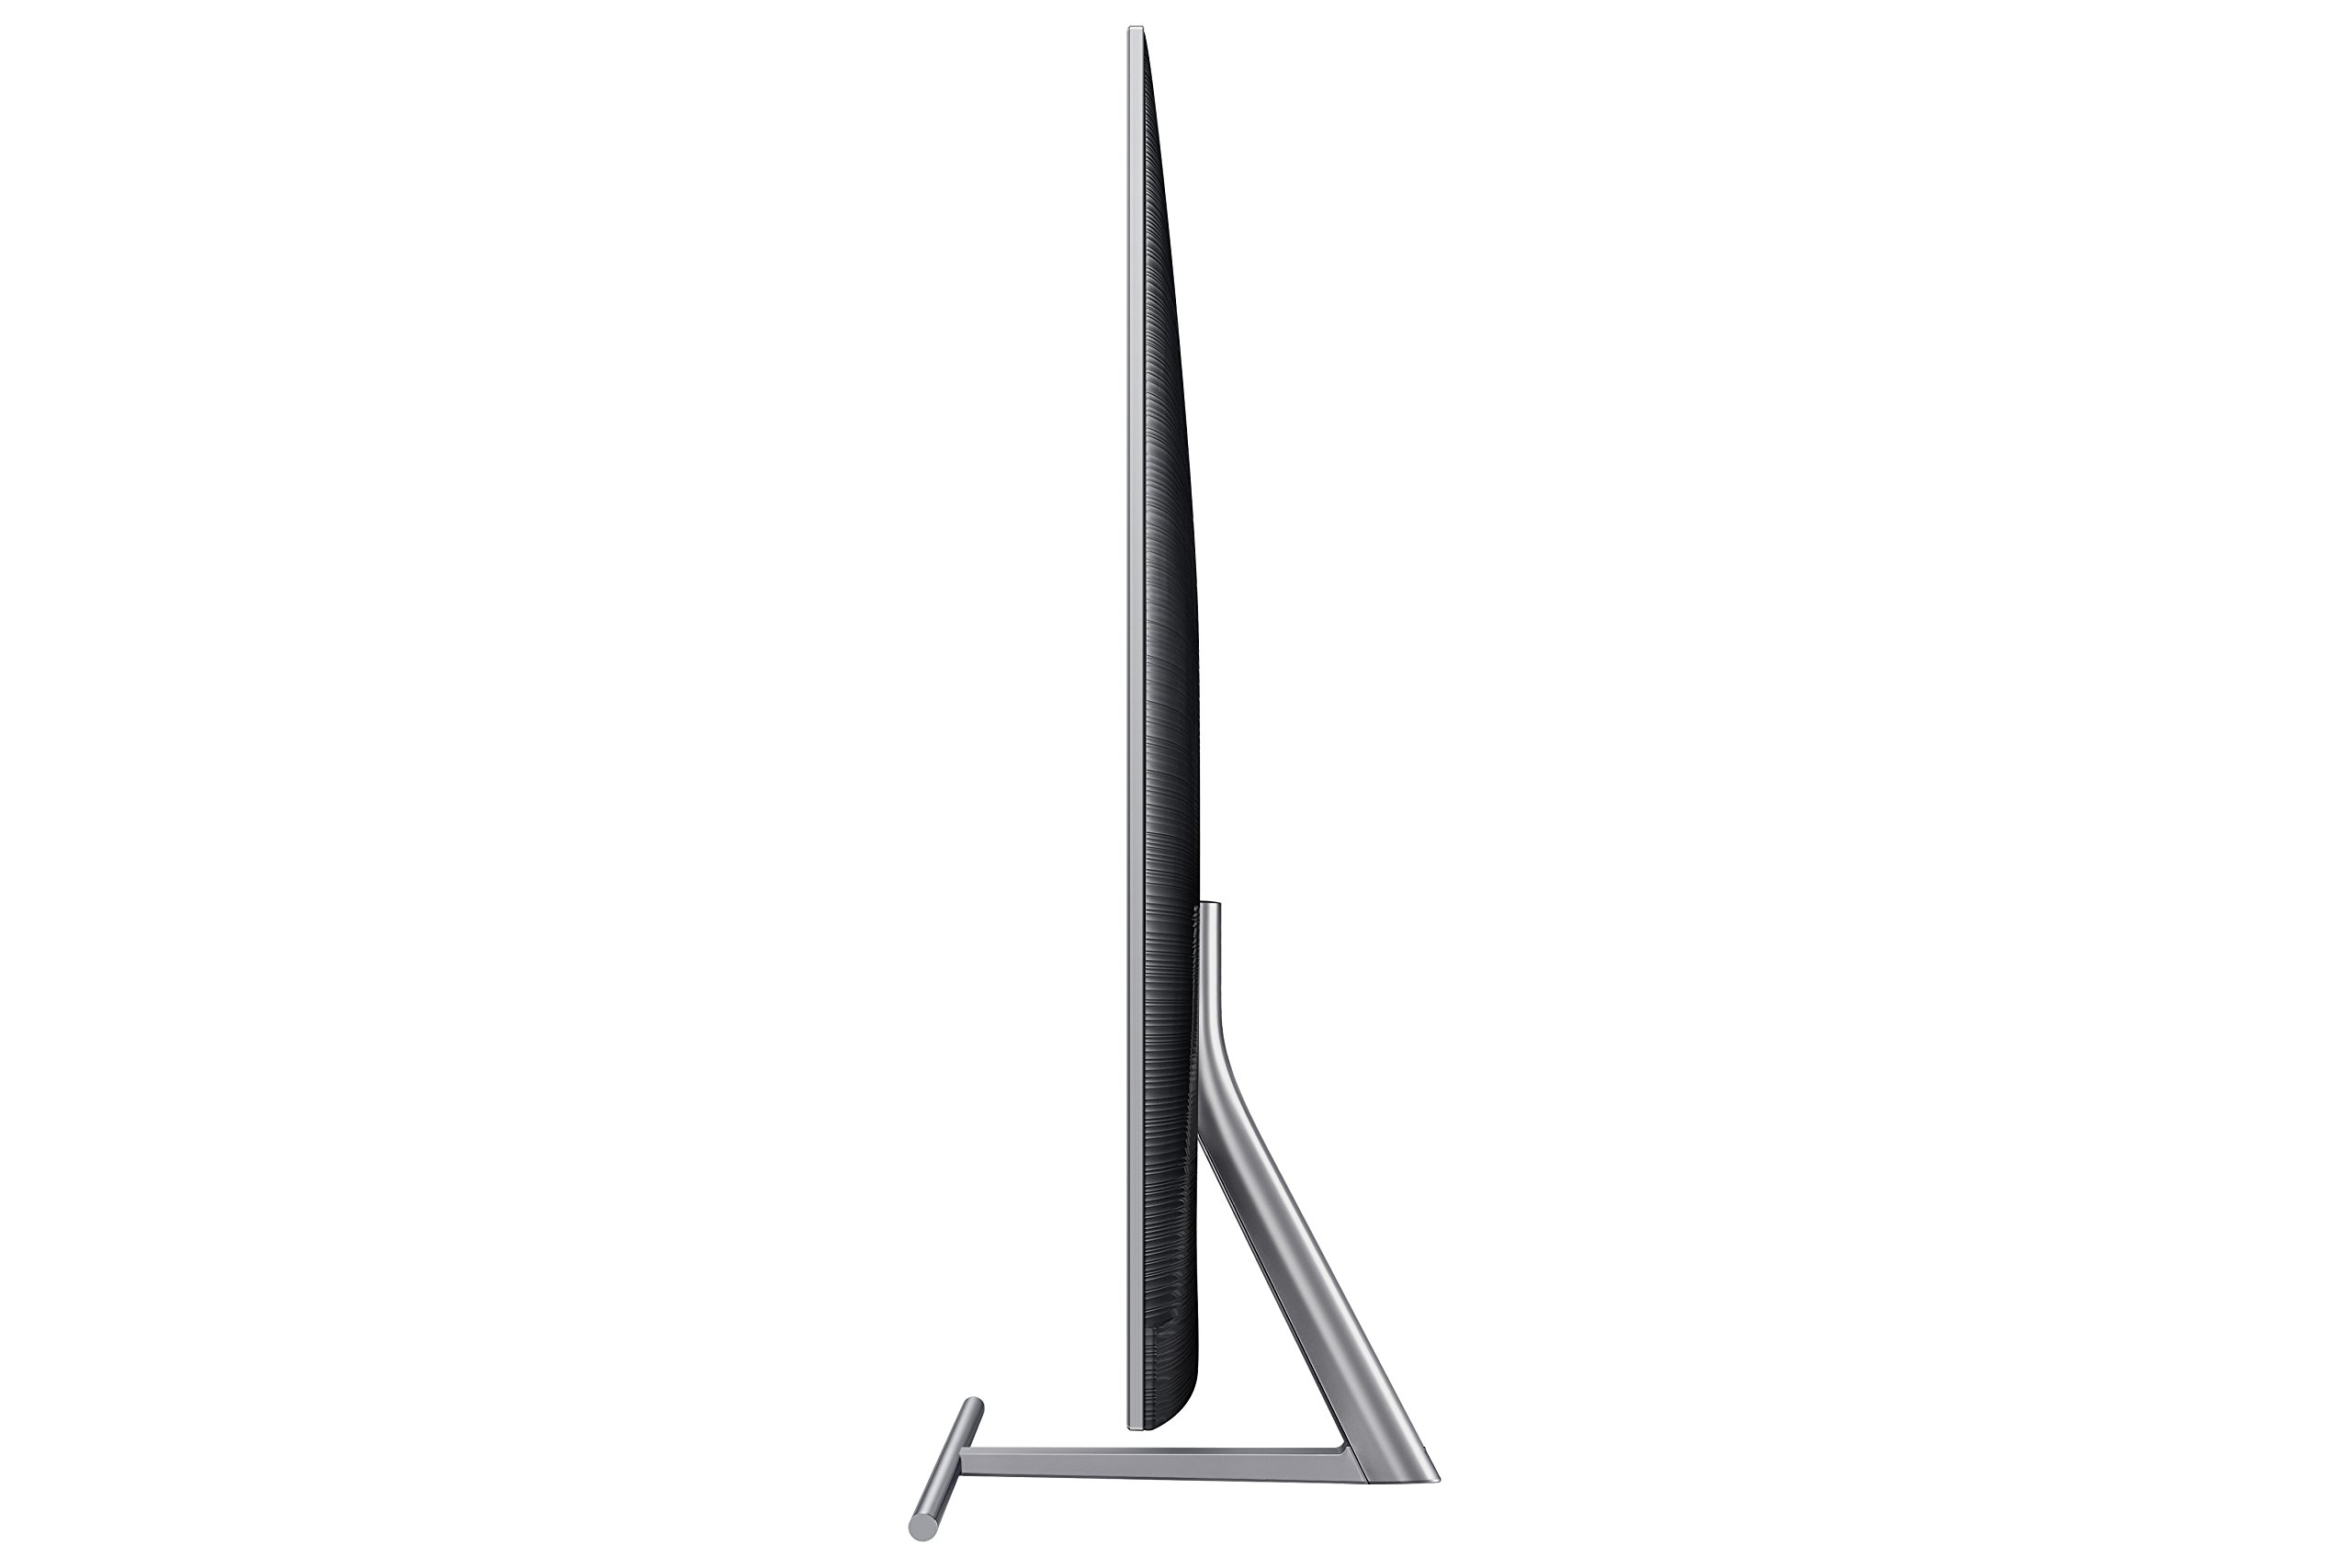 Samsung Flat QLED 4K UHD 7 Series Smart TV 2018 2